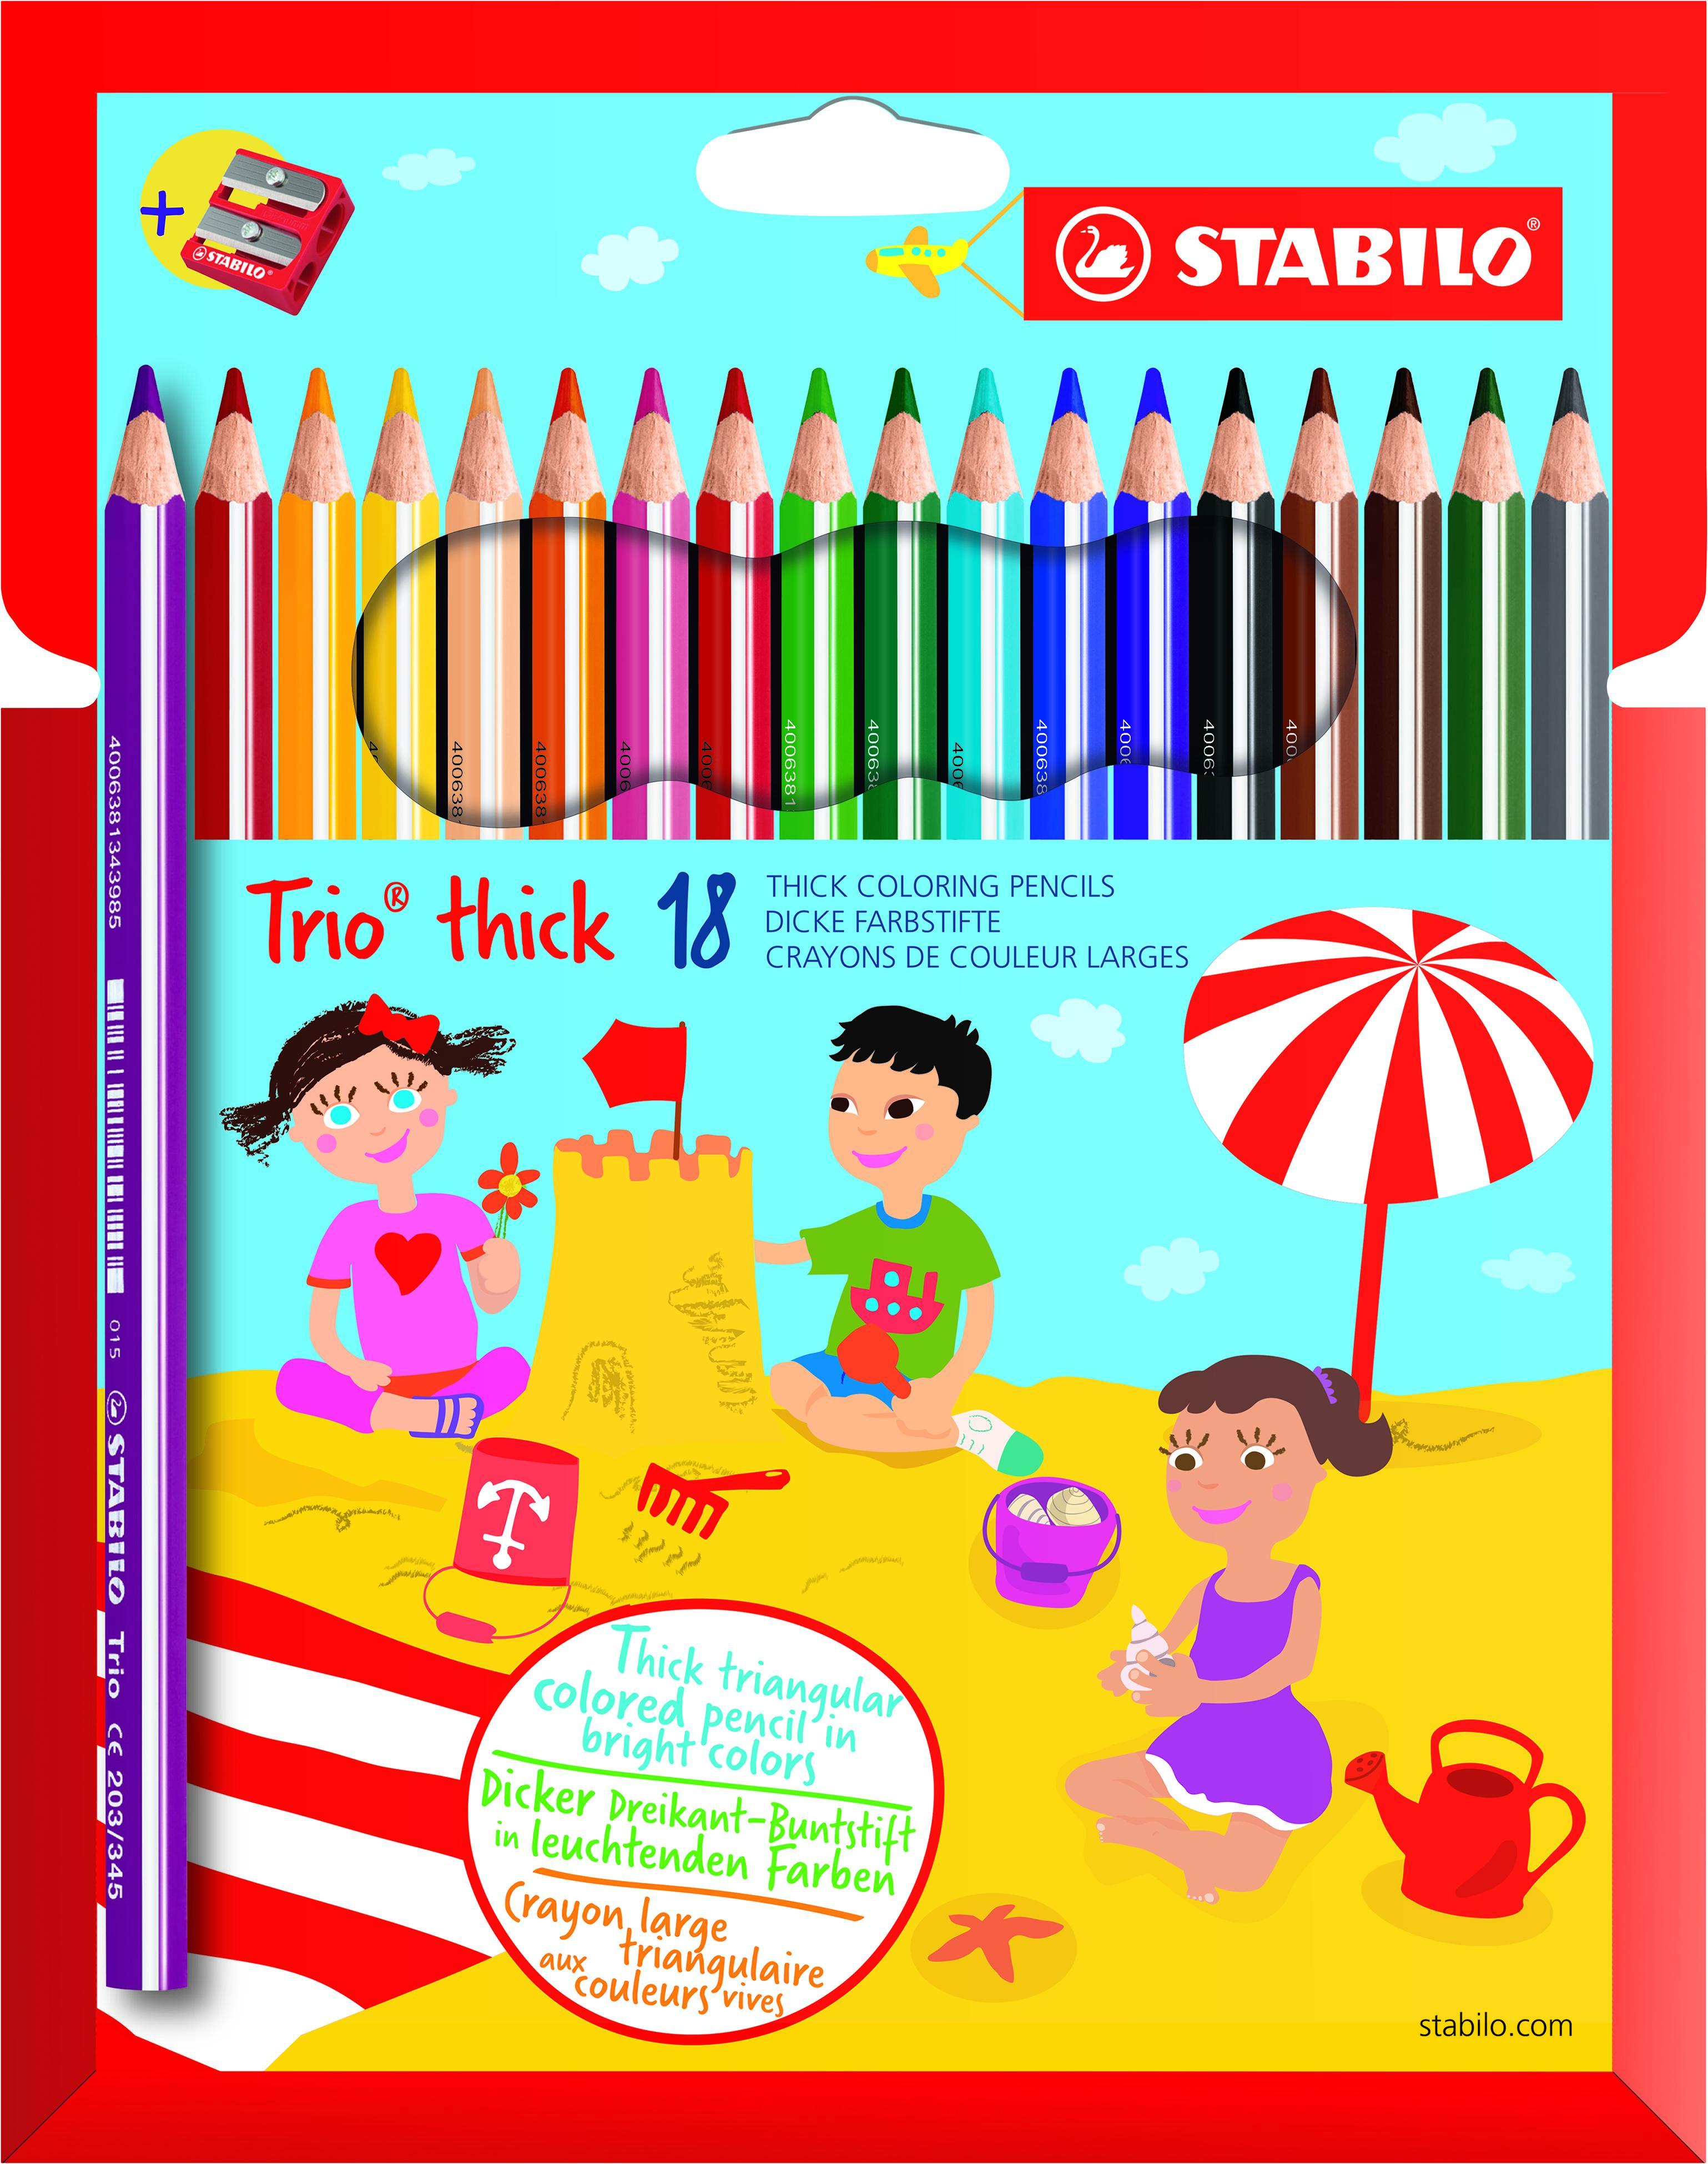 STABILO Trio thick - 18 crayons de couleur + 1 taille crayon